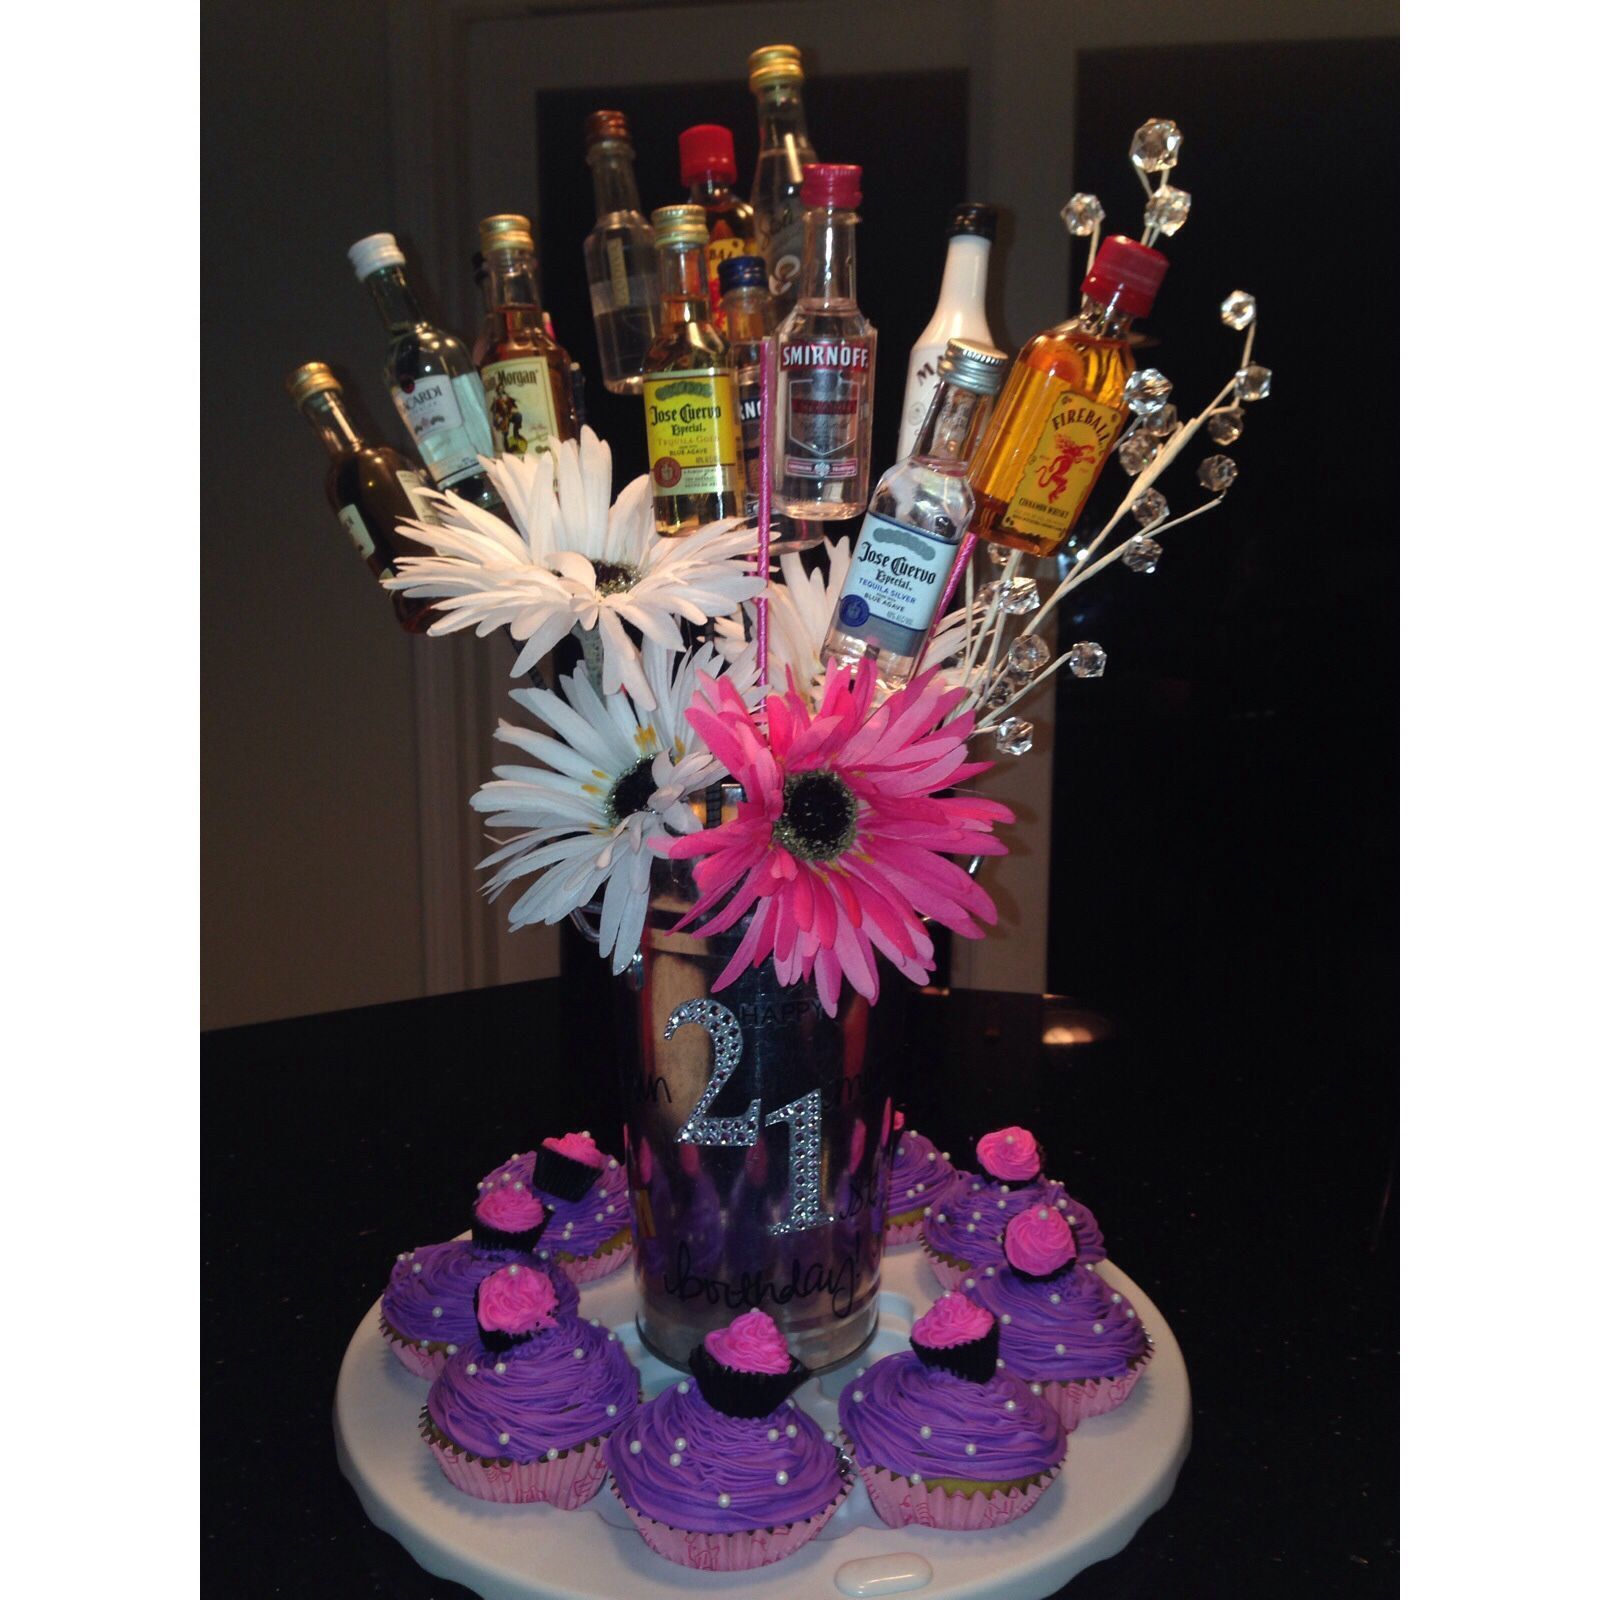 Liquor Bouquet for a 21st birthday ! Girly 21st birthday